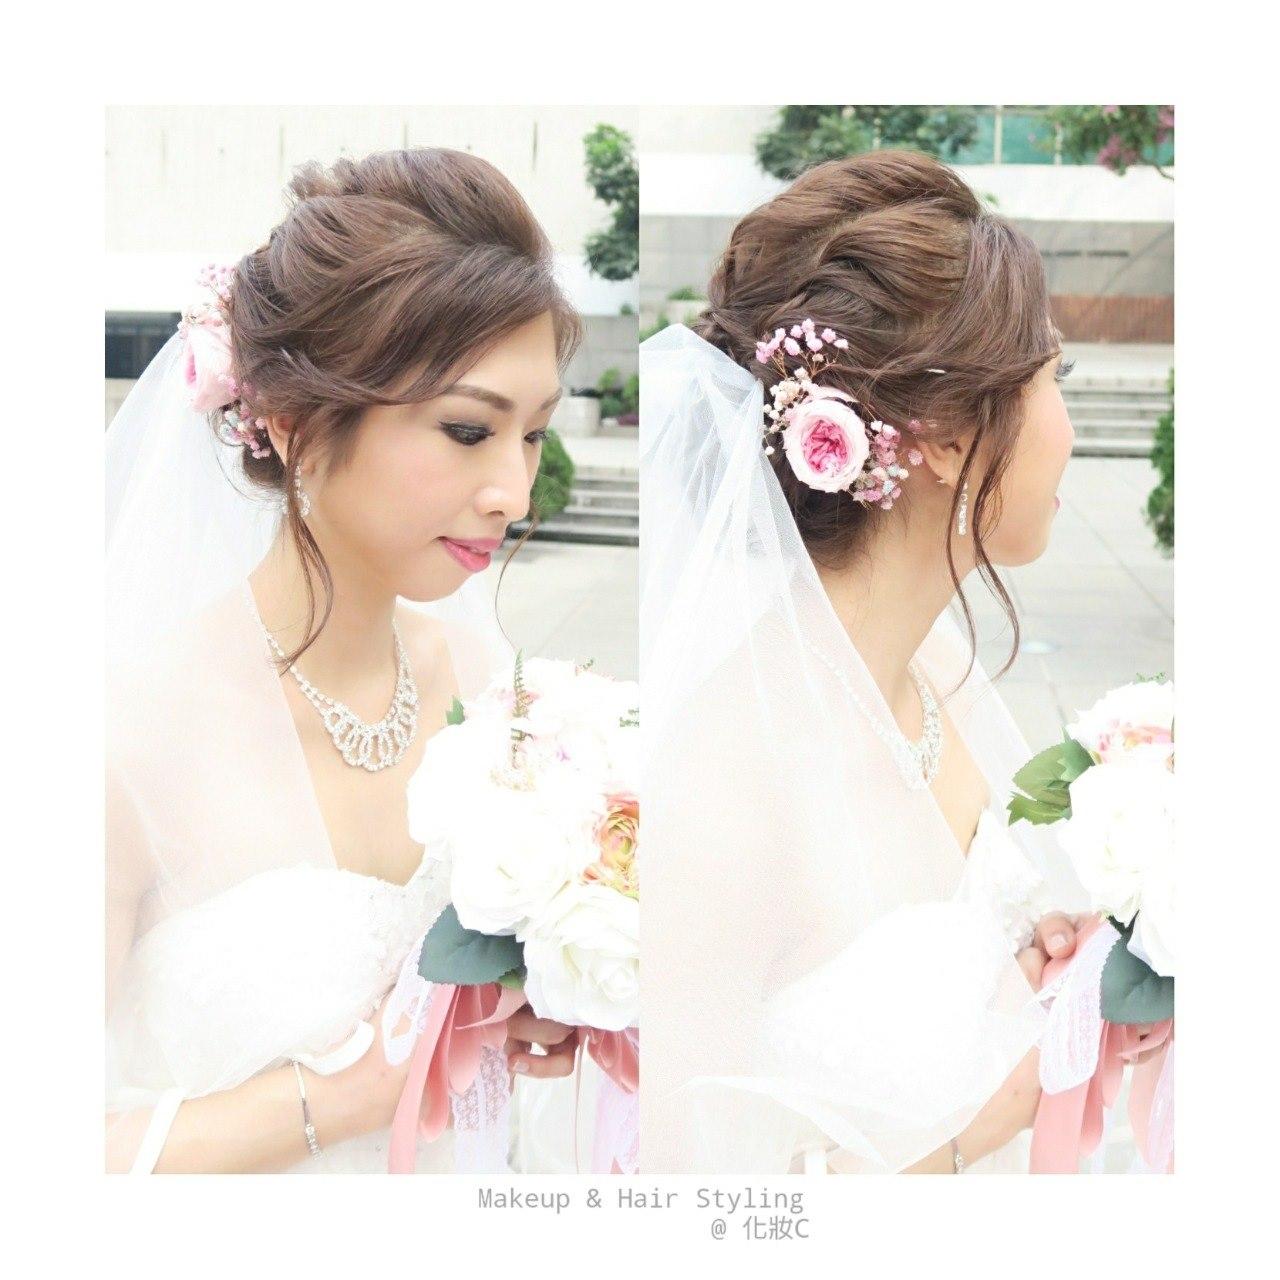 Makeup & Hair Styling @化妝c,flower,hair,bride,gown,hair accessory